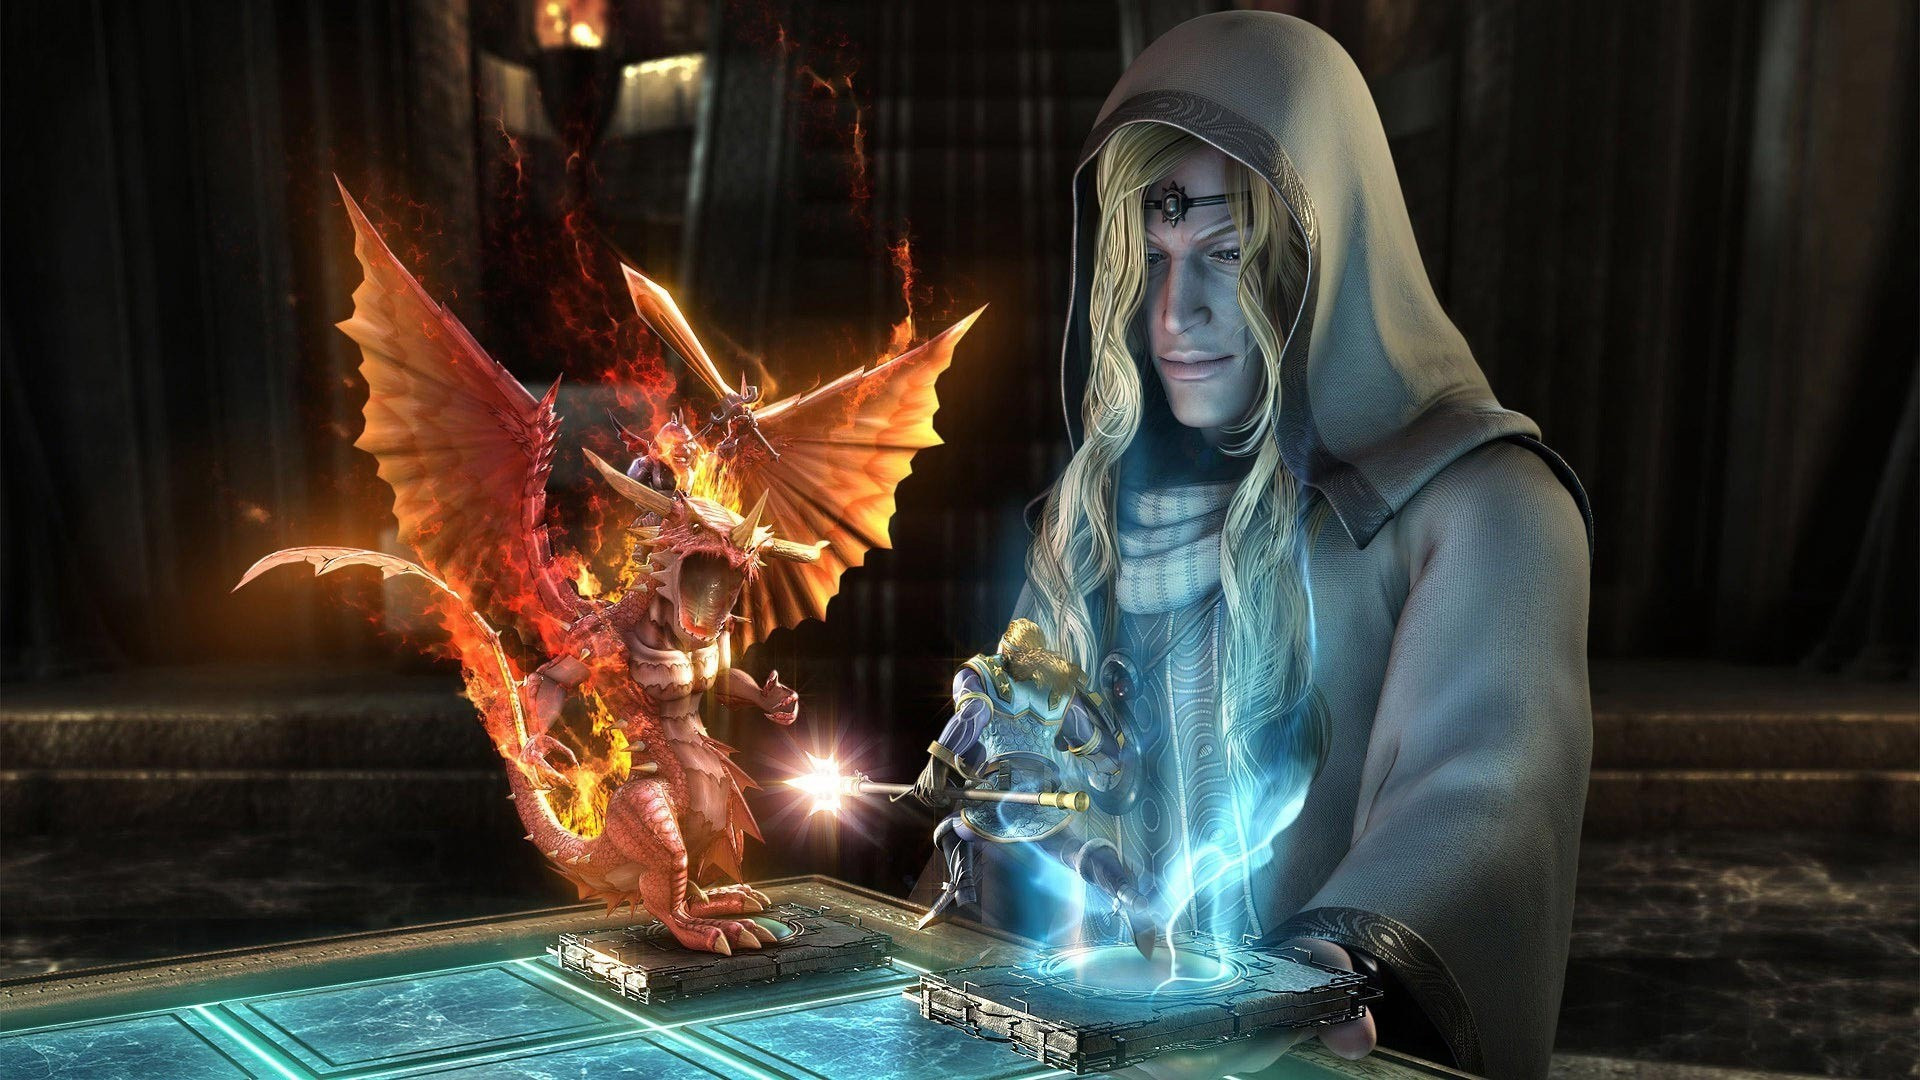 Dragon vs warrior wallpaper #811